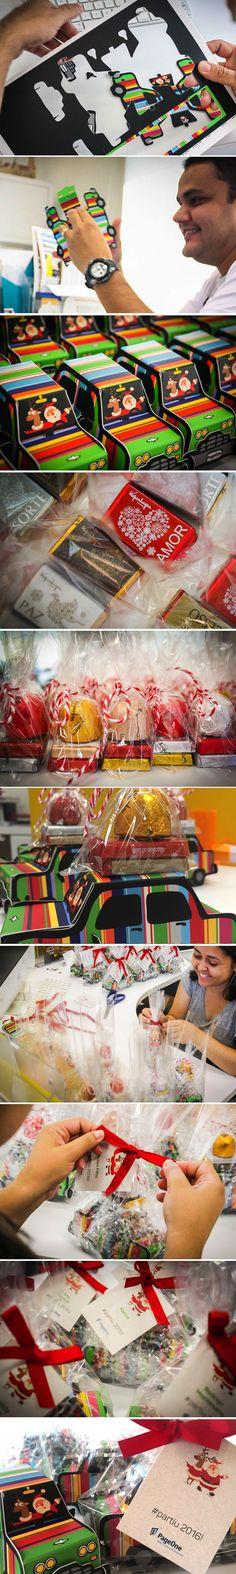 Brinde de Natal da PageOne em 2015! #gift #natal #christmas #love #color #merrychristmas #xmas #decor #graficdesign #packaging